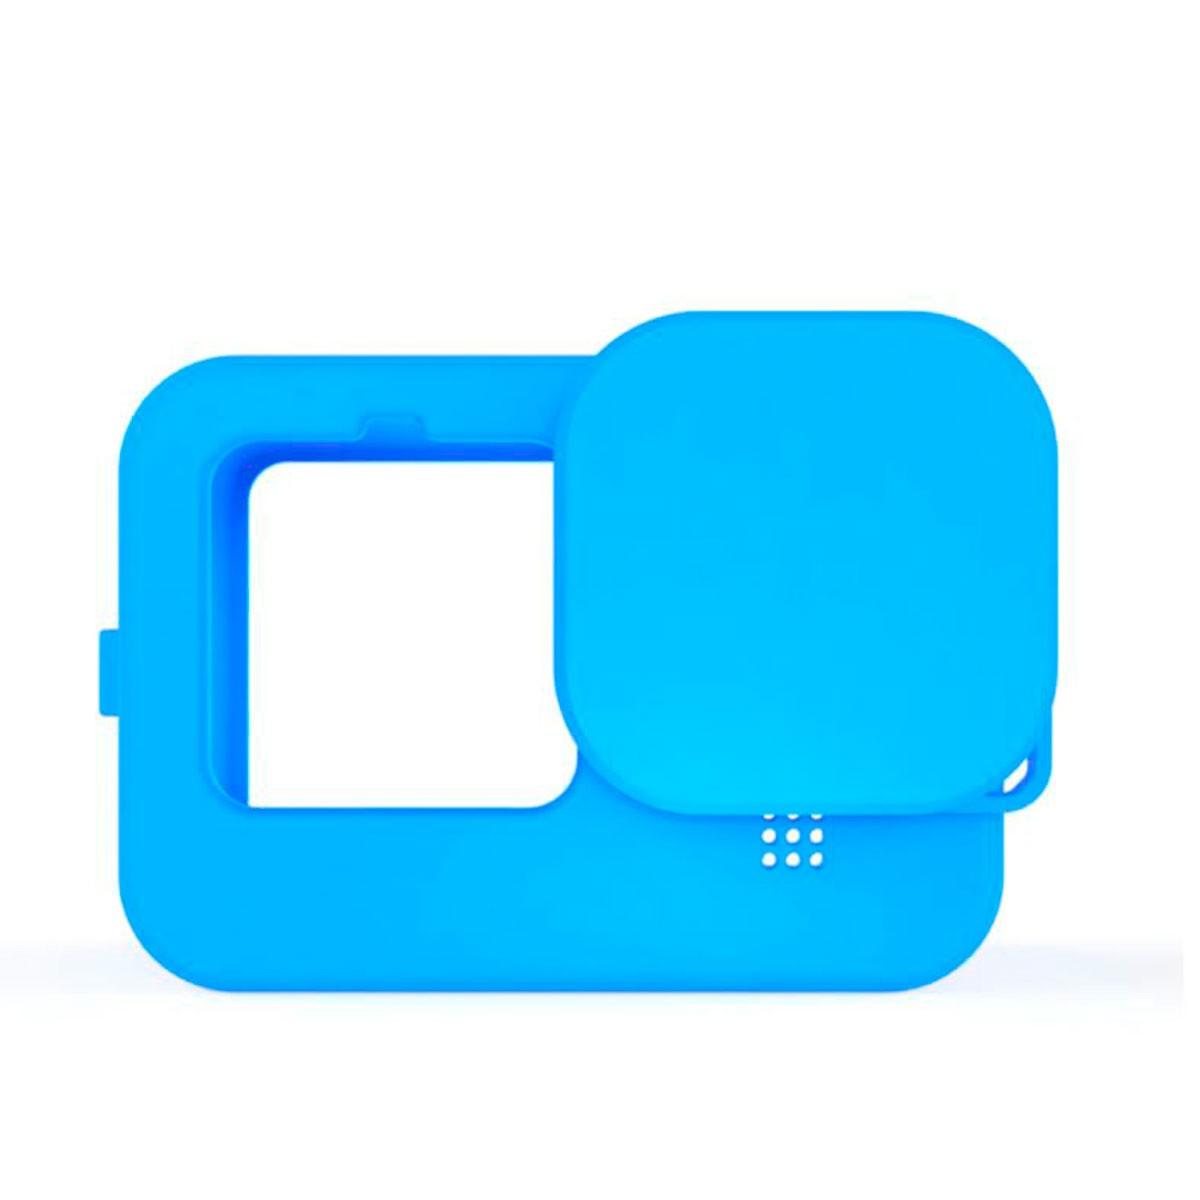 Capa Protetora de Silicone - GoPro Hero9 Black